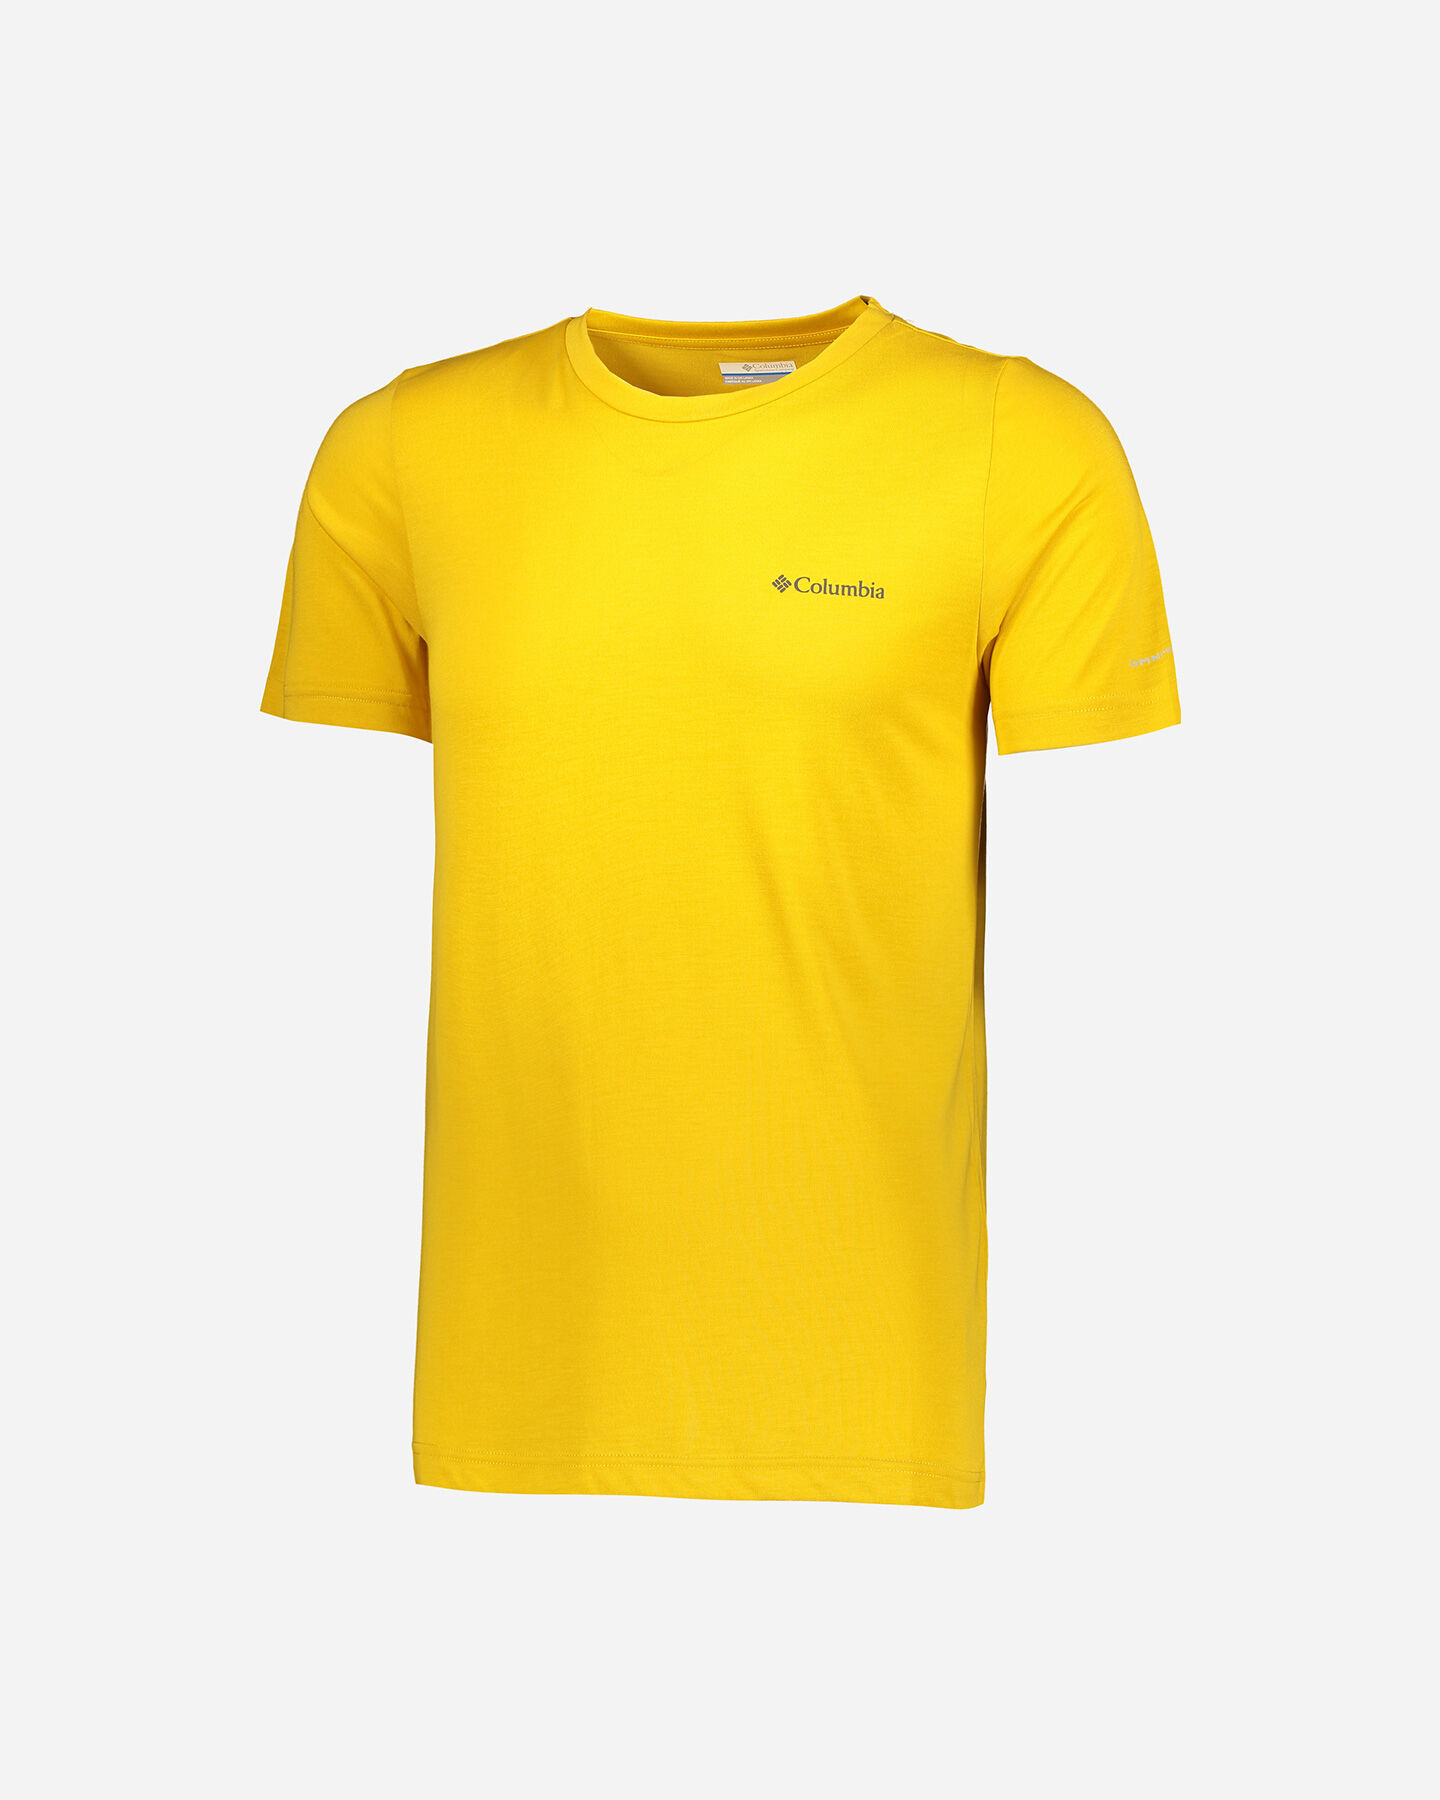 T-Shirt COLUMBIA MAXTRAIL LOGO M S5174871 scatto 0